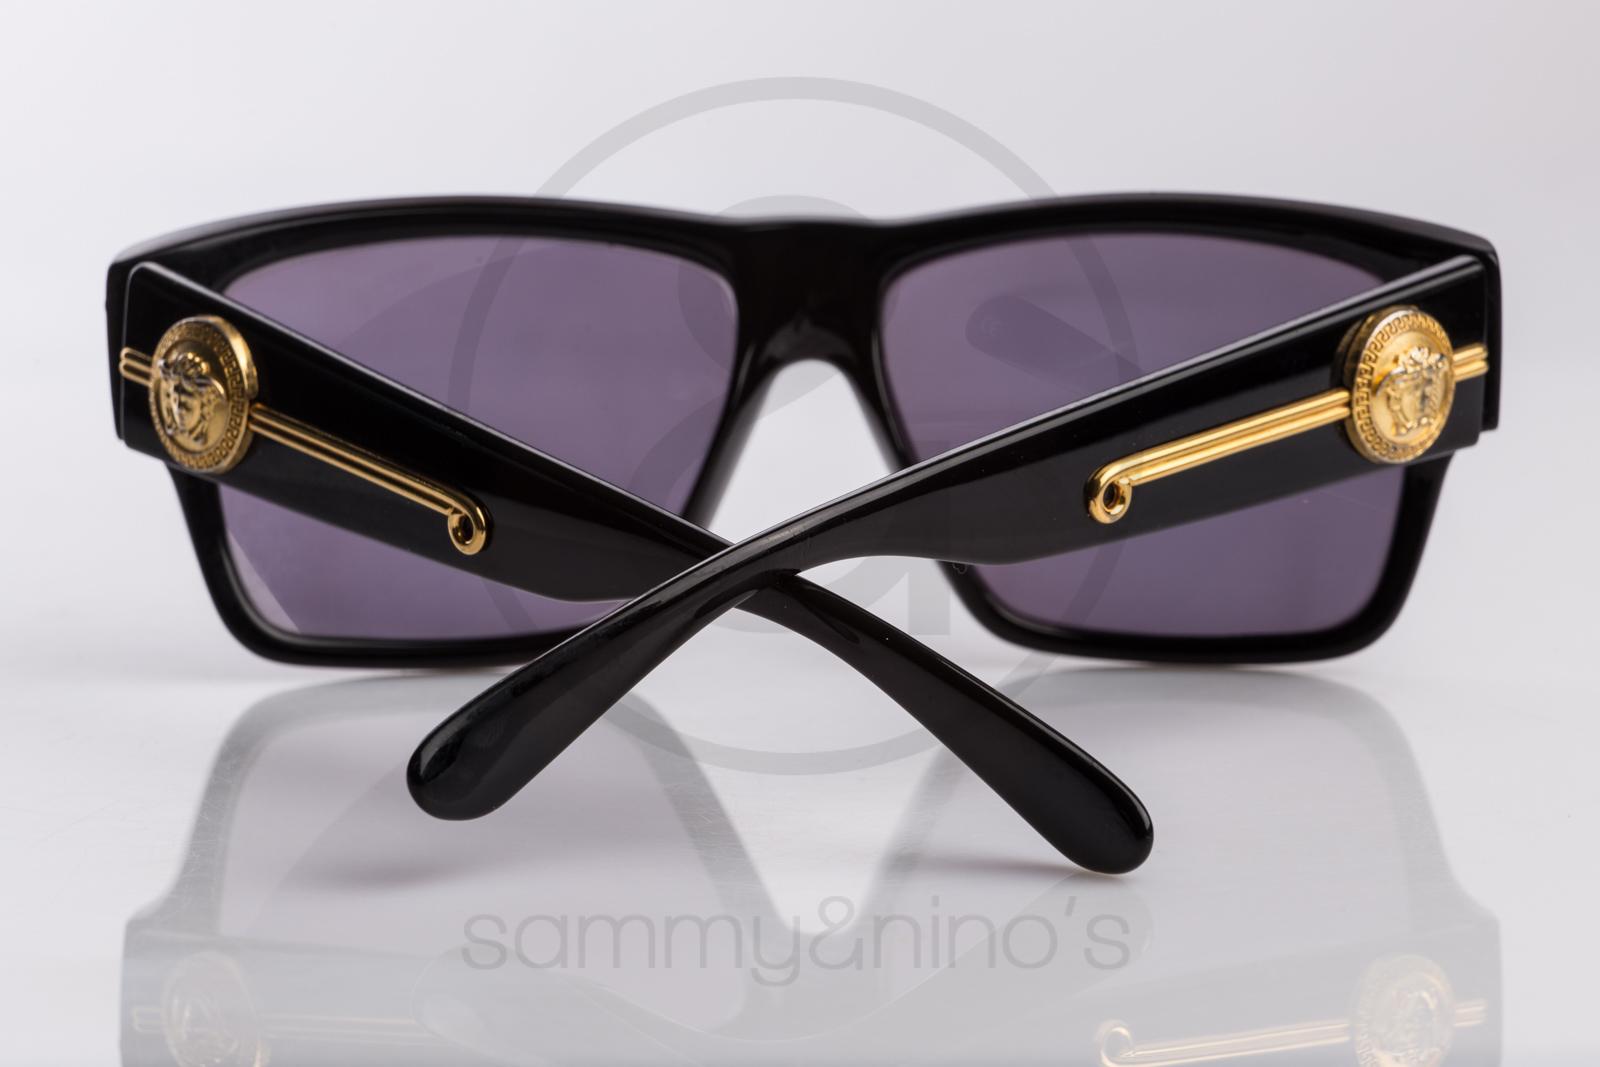 d11ab9721cef Sunglasses Vintage Versace   City of Kenmore, Washington